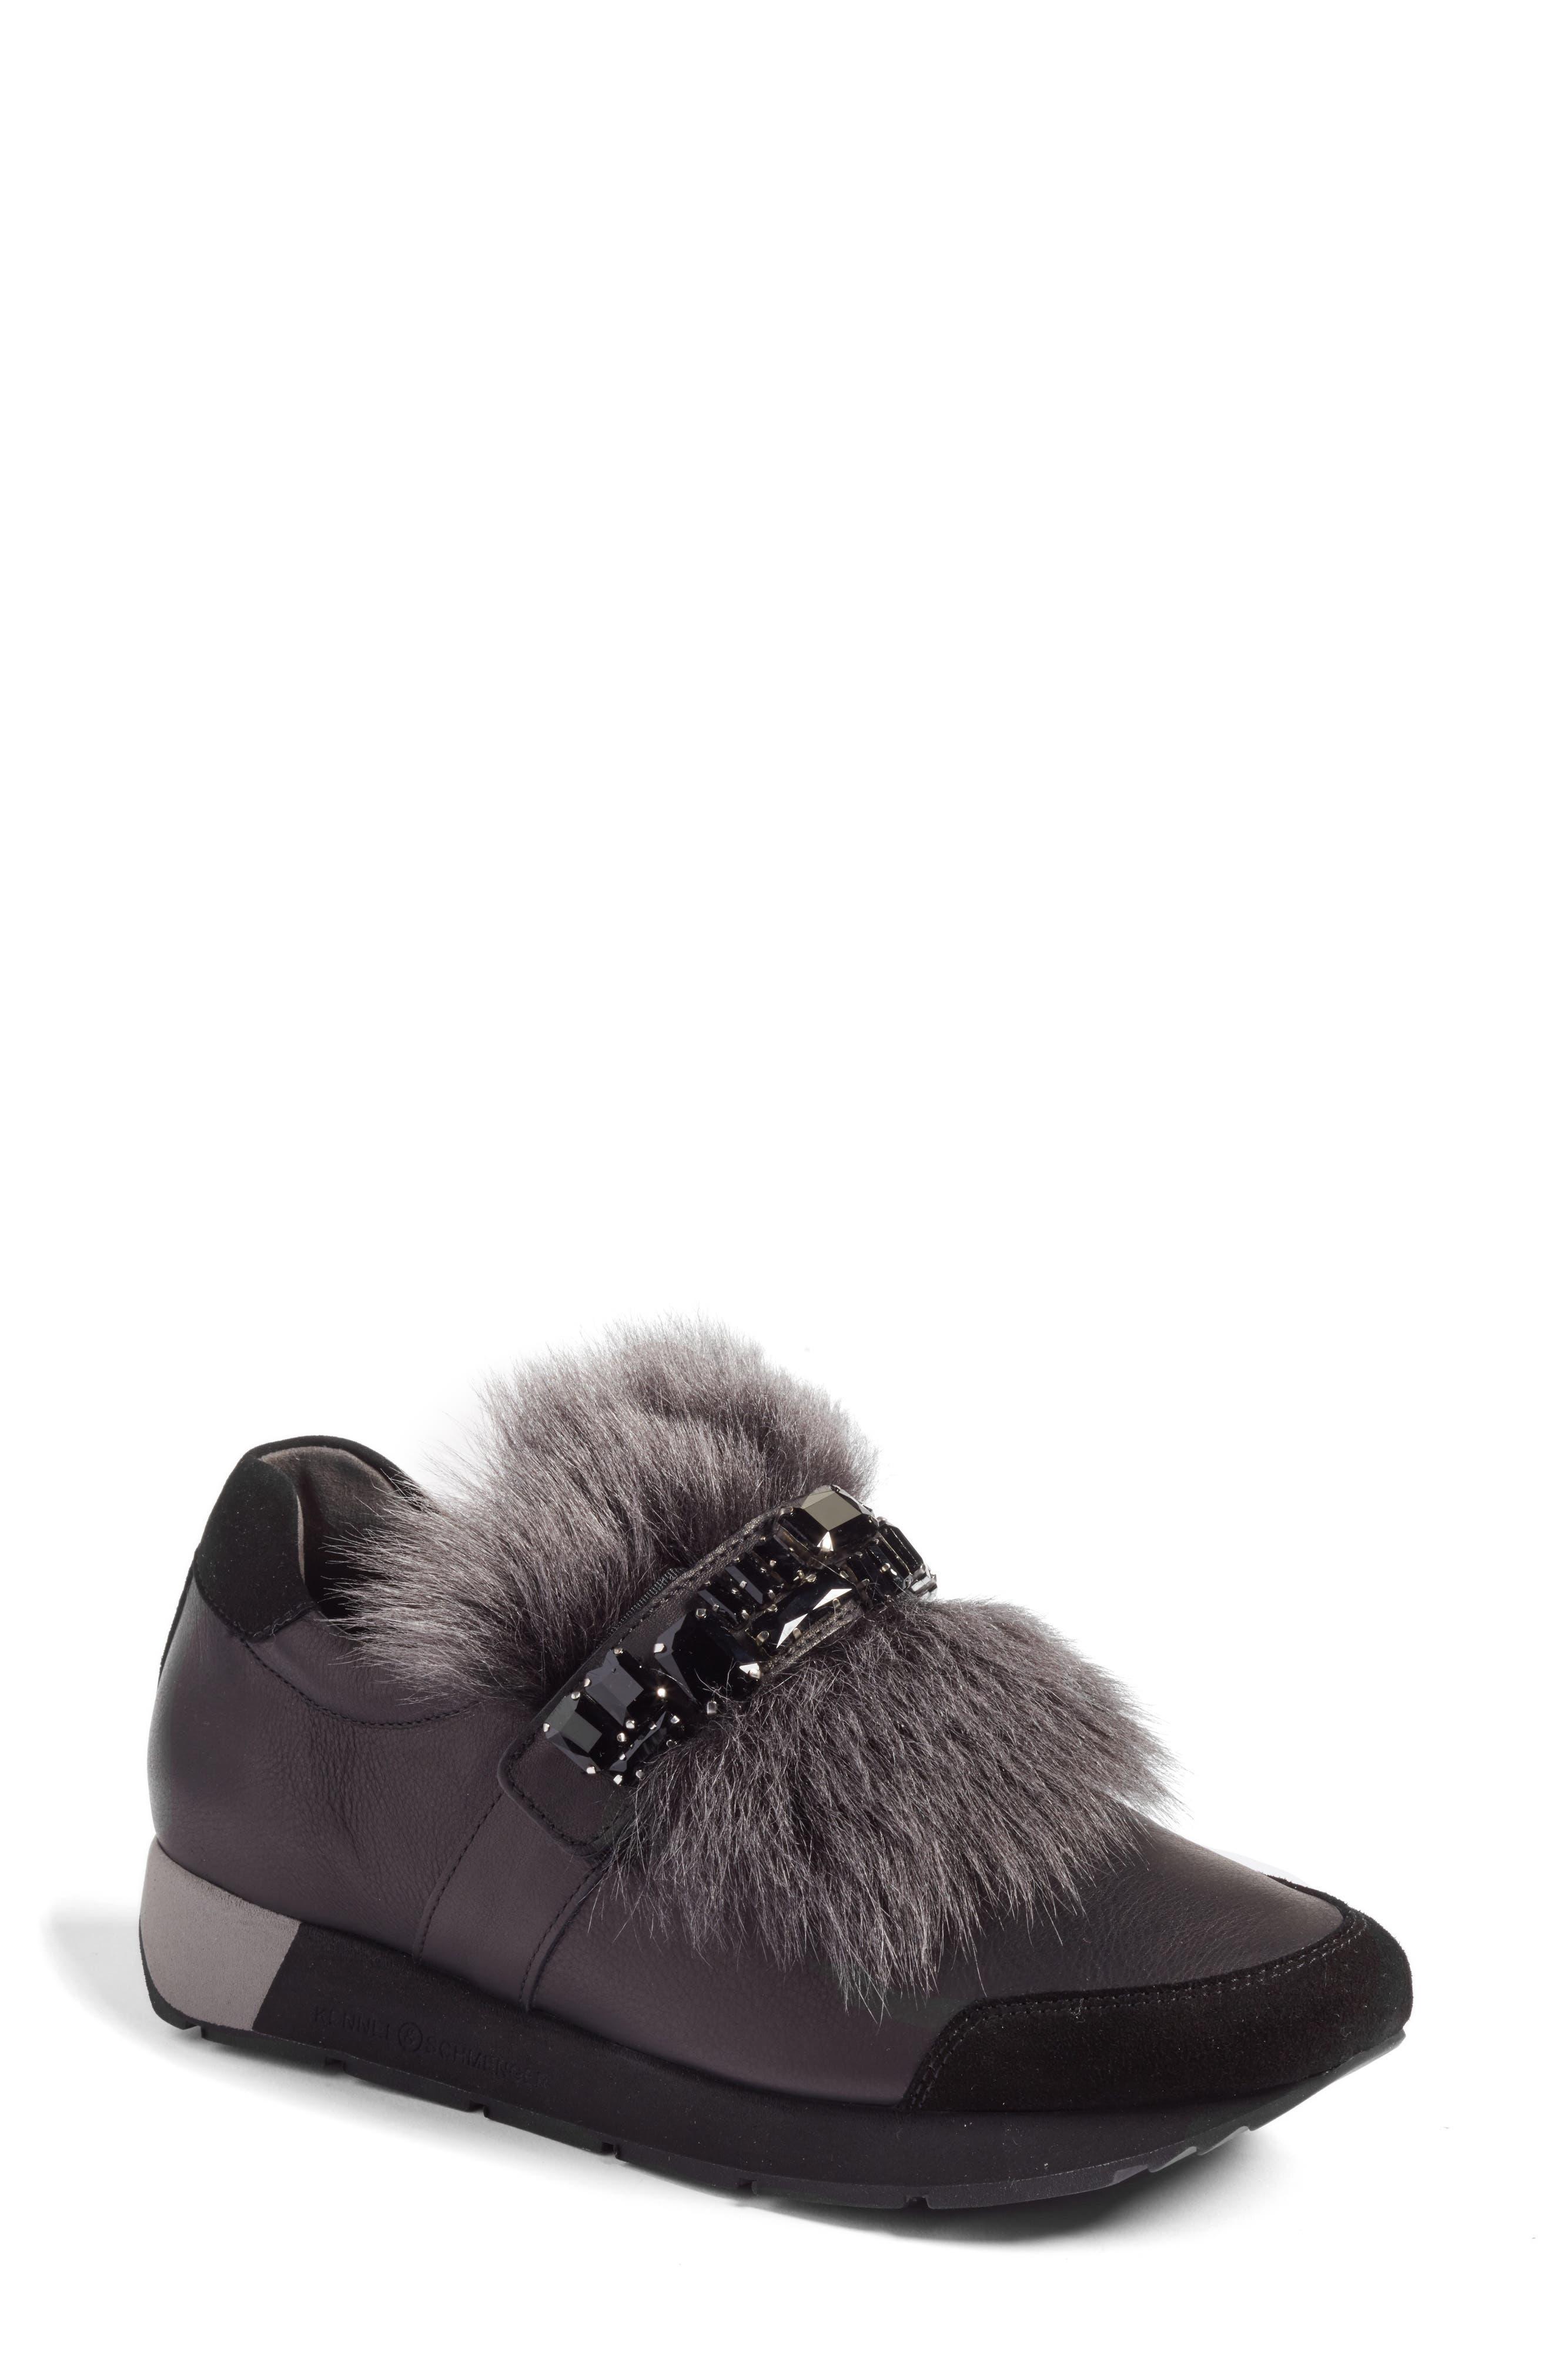 Kennel & Schmenger Racer Slip-On Sneaker with Genuine Shearling Trim,                         Main,                         color,